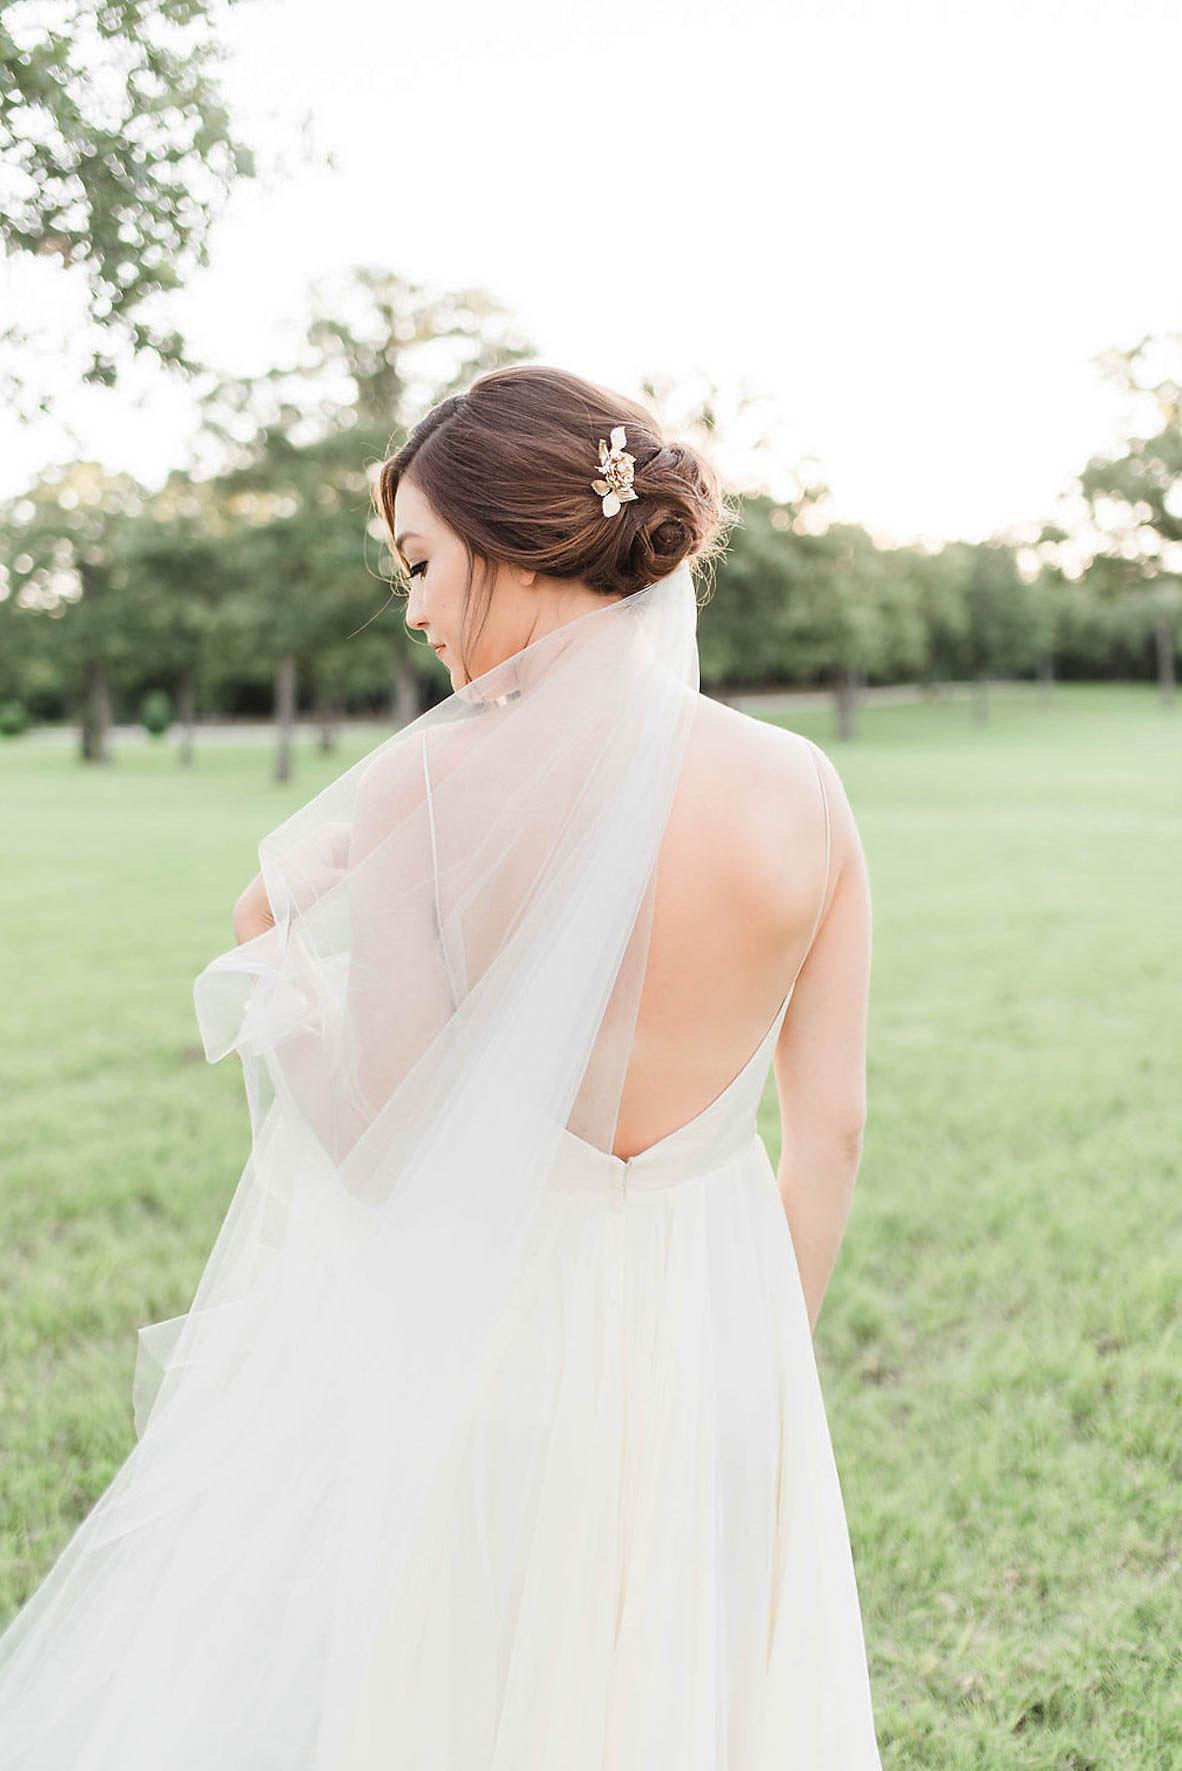 Heirloom Bridal Portraits at The Grove   Gray Door Photography   Dallas Wedding Photographer